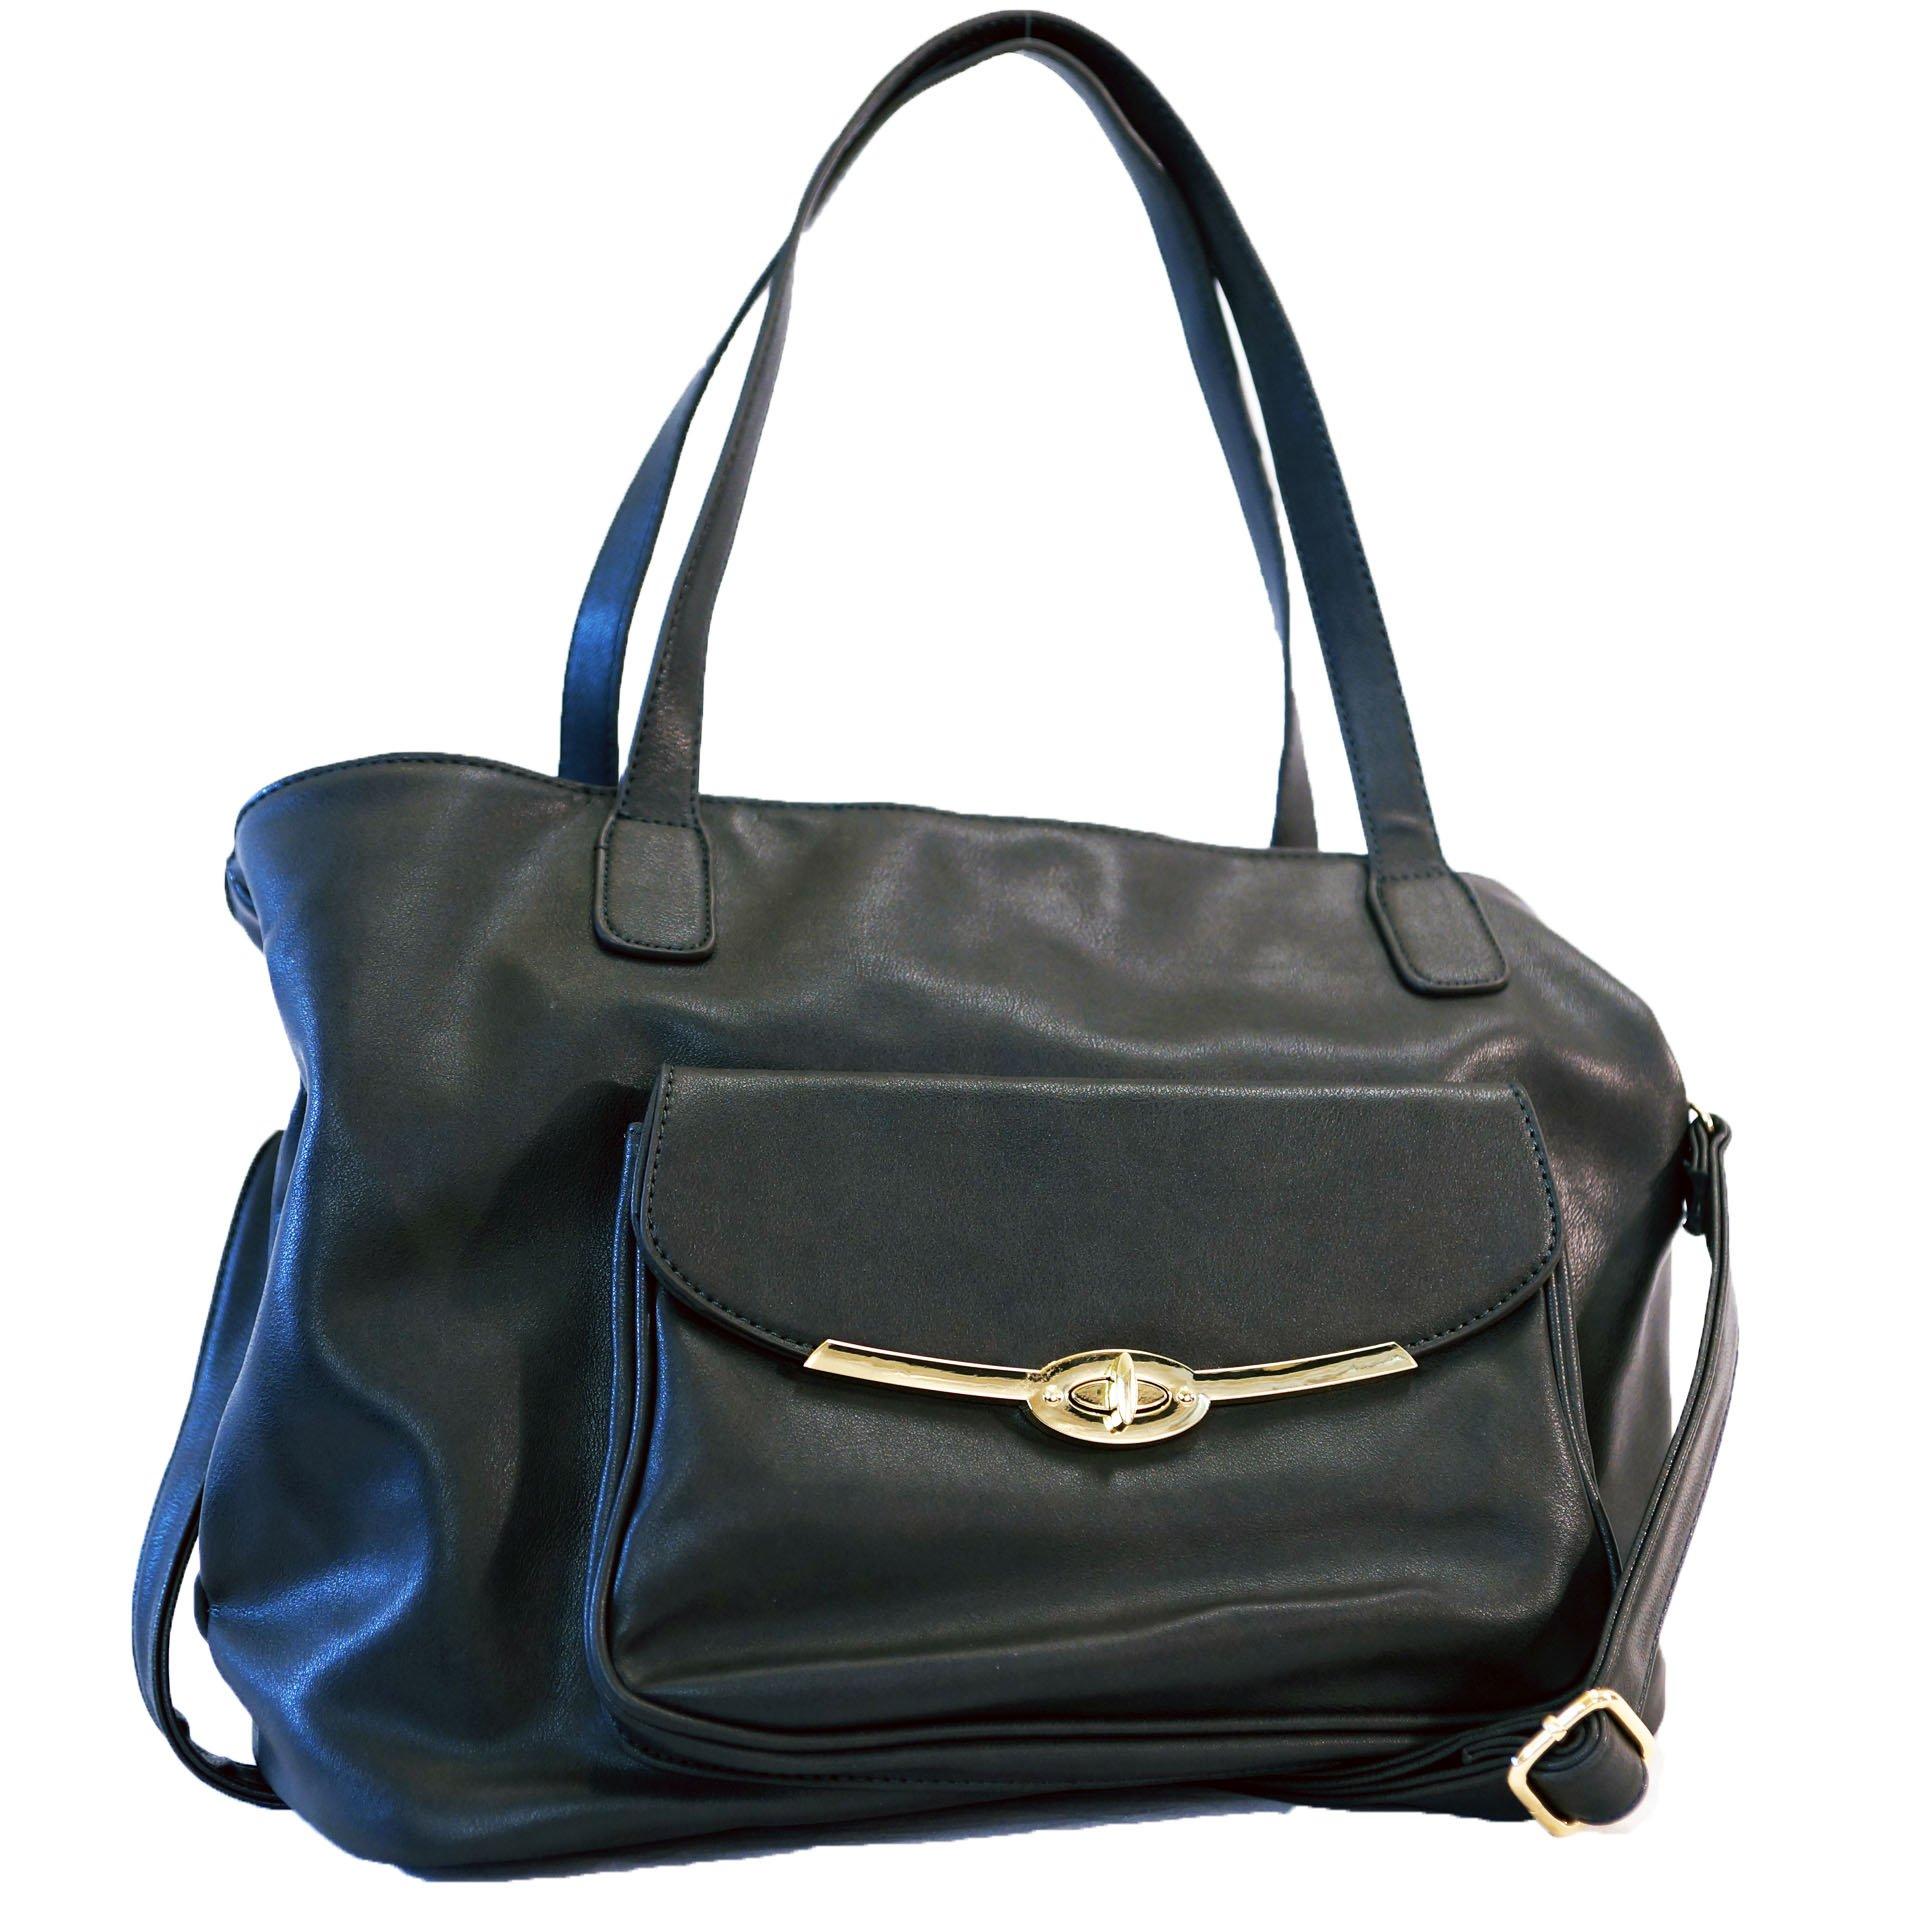 Got Oil Supplies Essential Oils Hobo Bag for Women - Dark Gray Leather Designer Handbag Purse with 16 Elastic Pockets